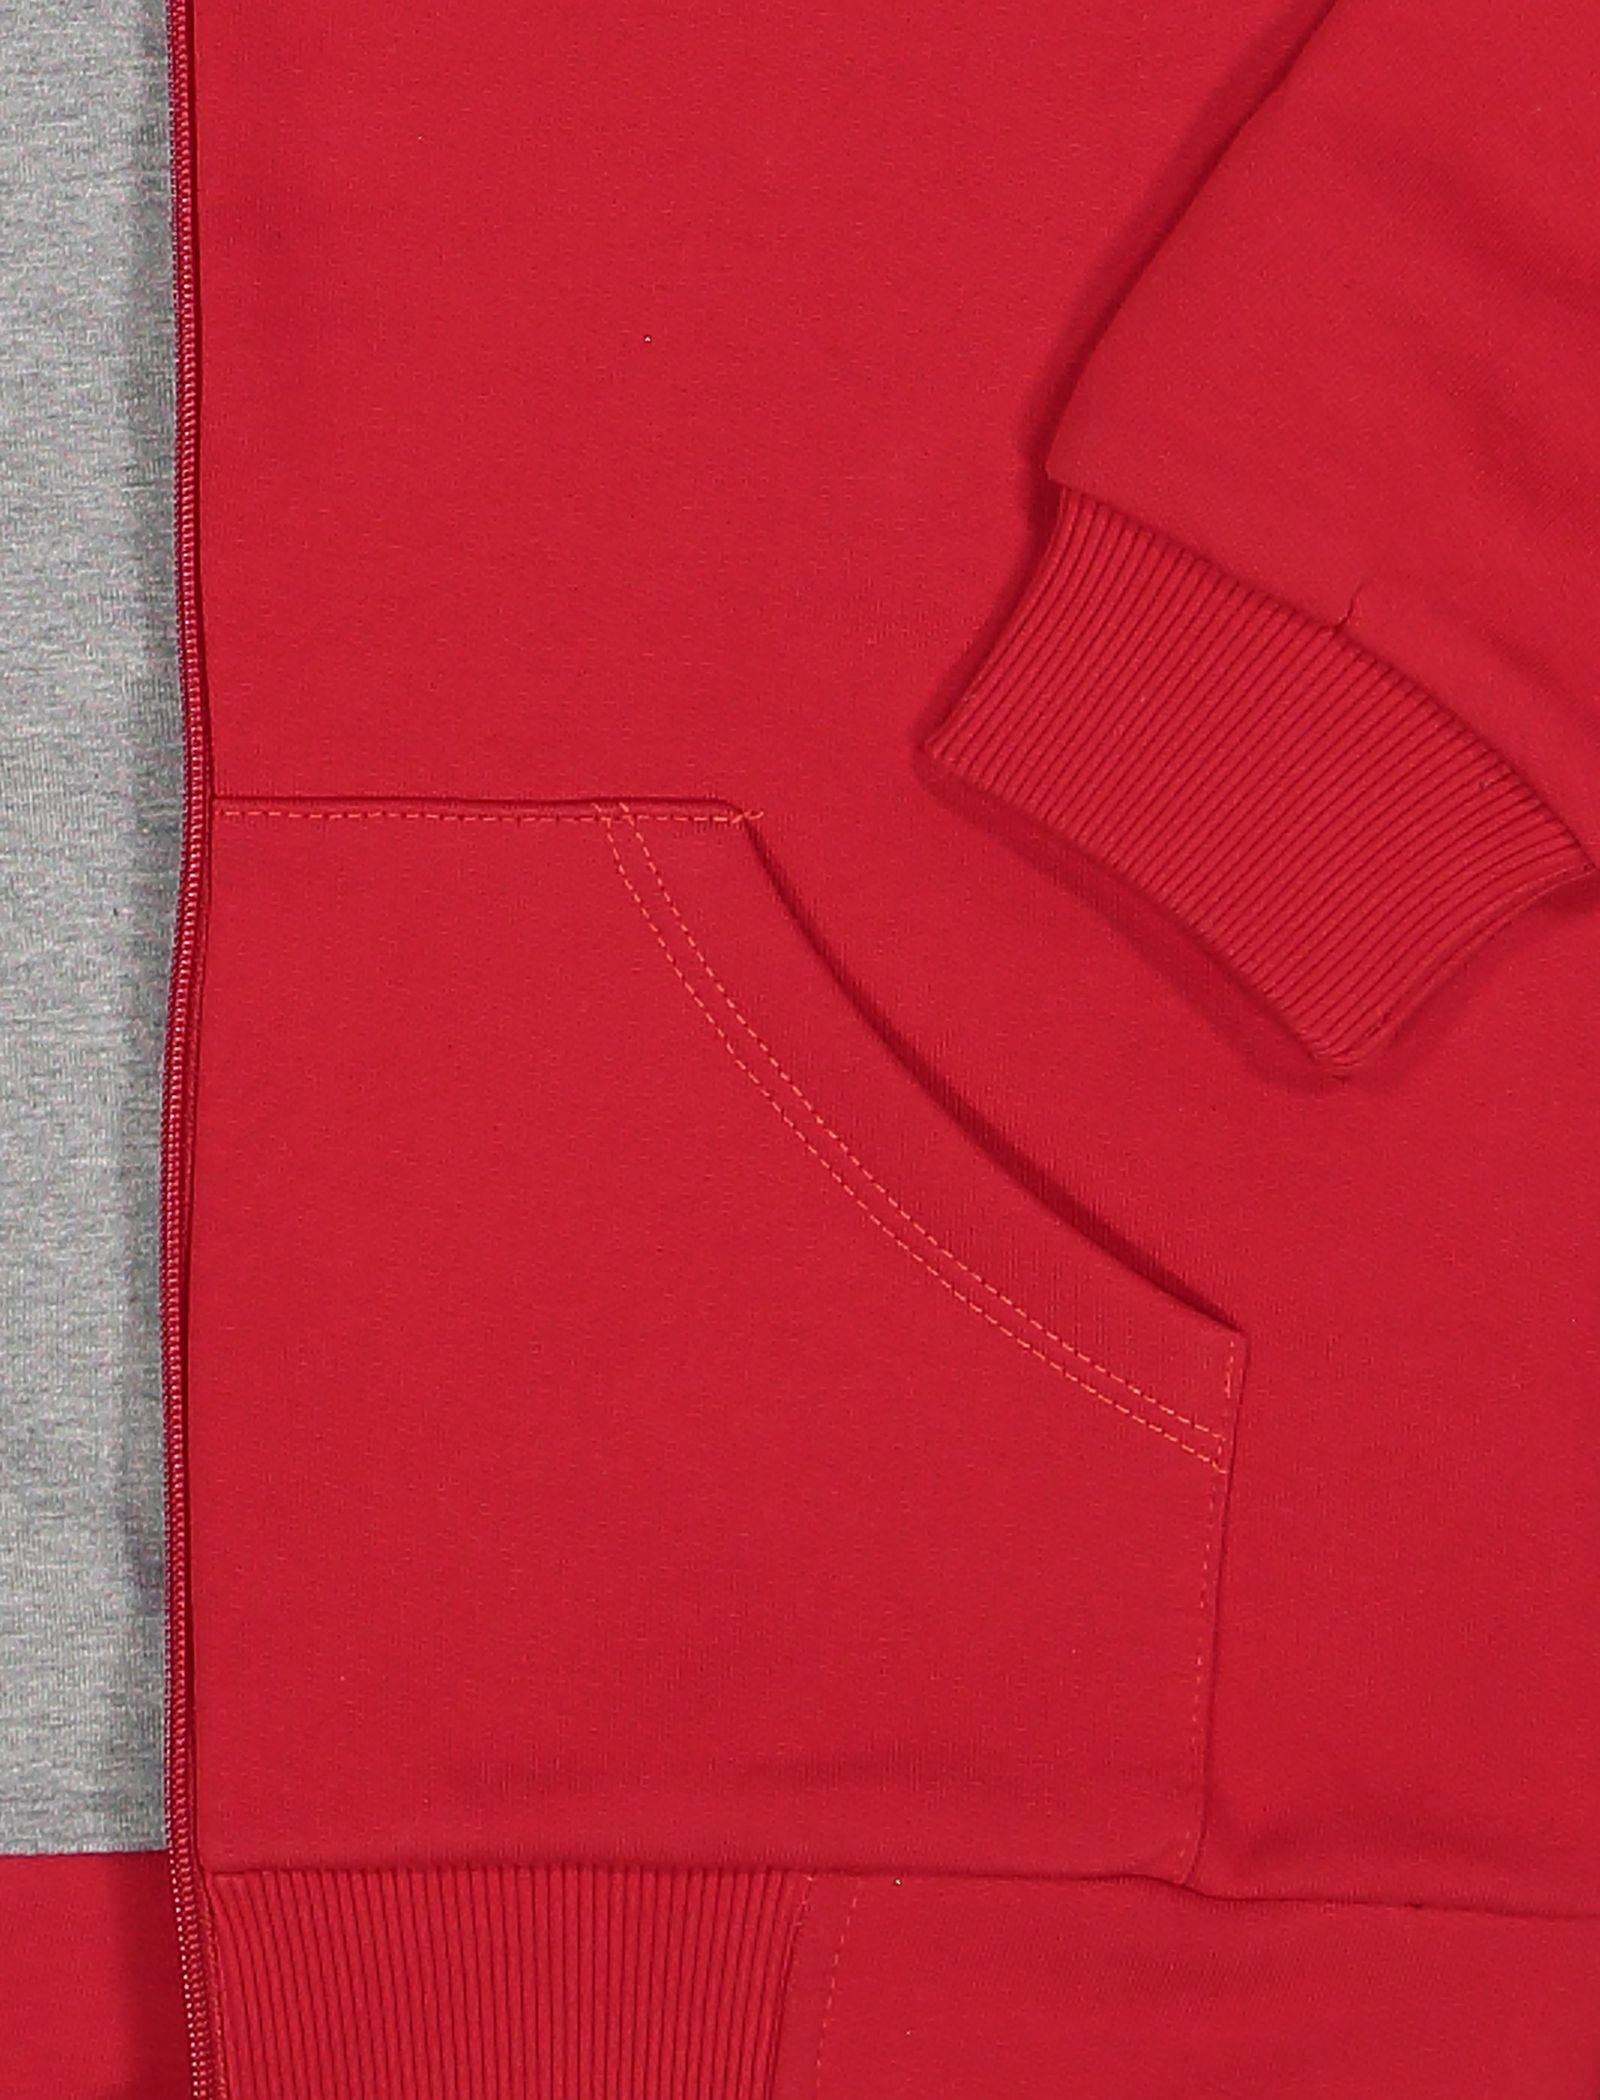 هودی نخی زیپ دار دخترانه - سون پون - طوسي و قرمز - 3